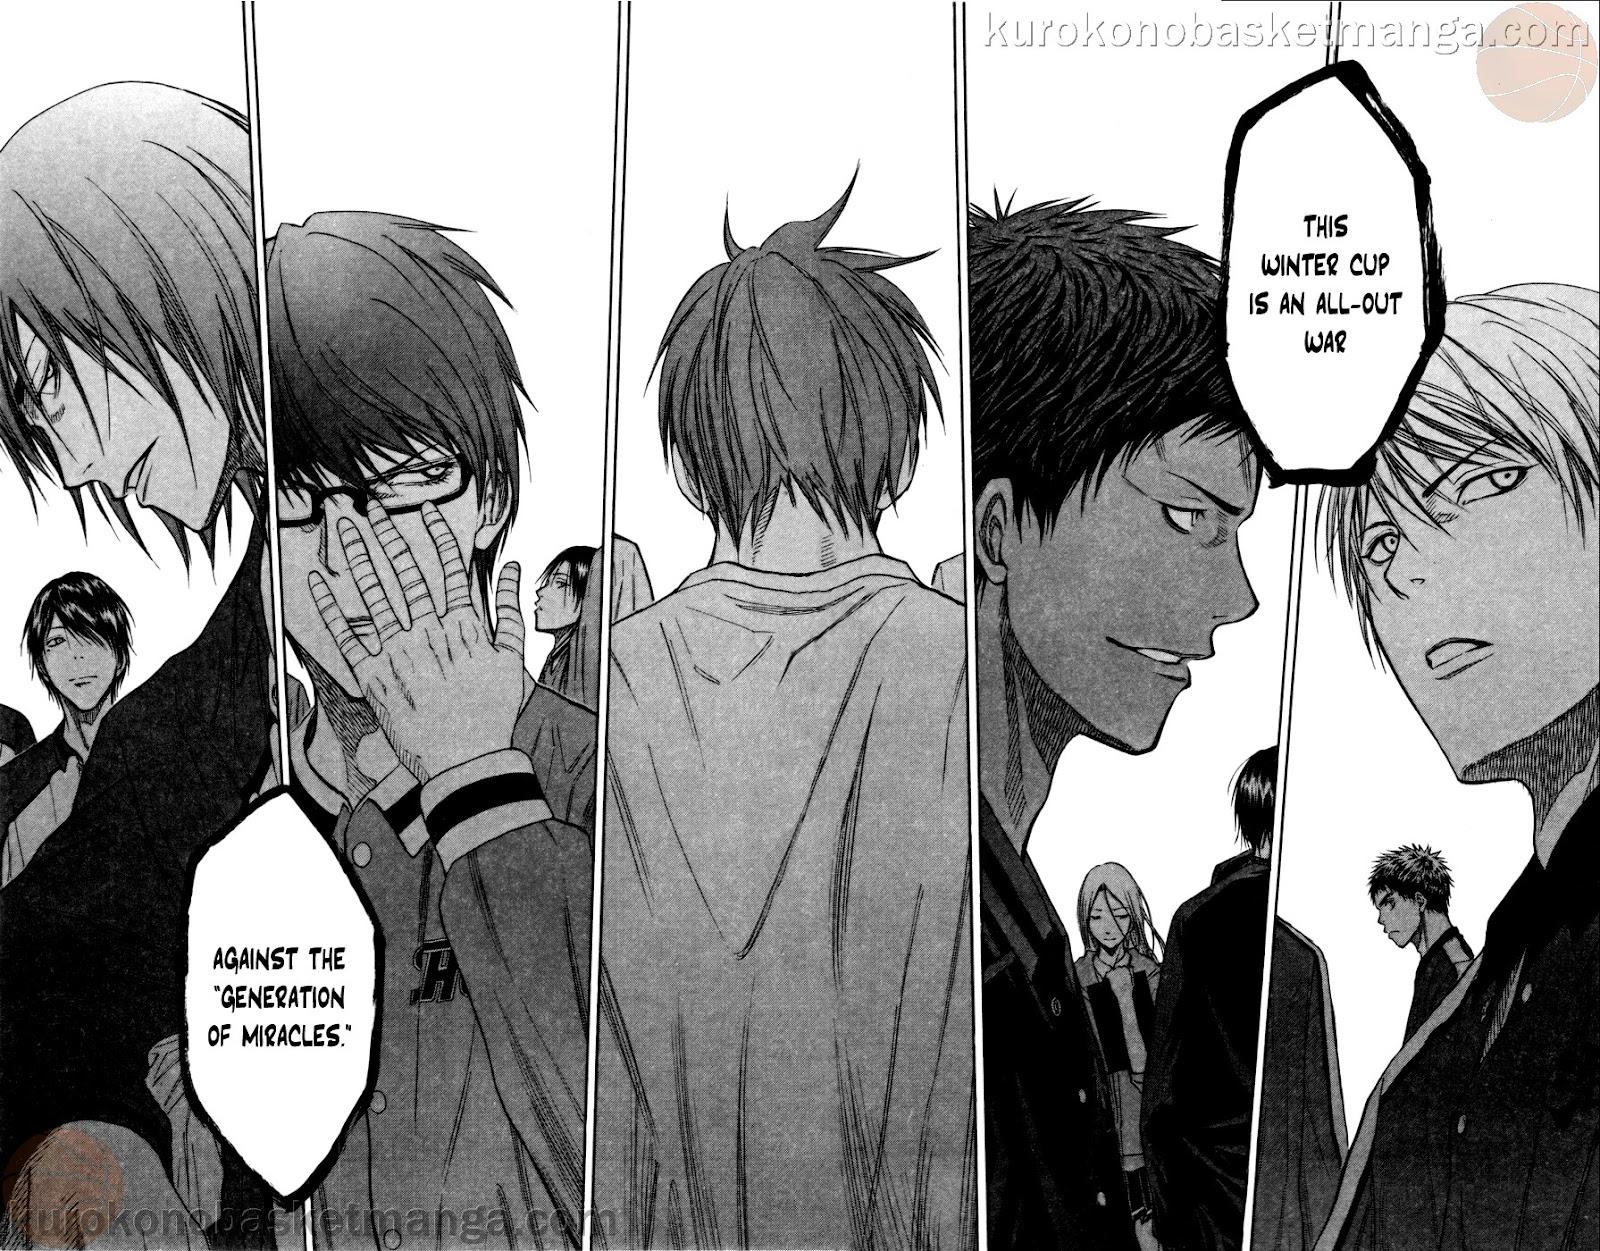 Kuroko no Basket Manga Chapter 108 - Image 16-17